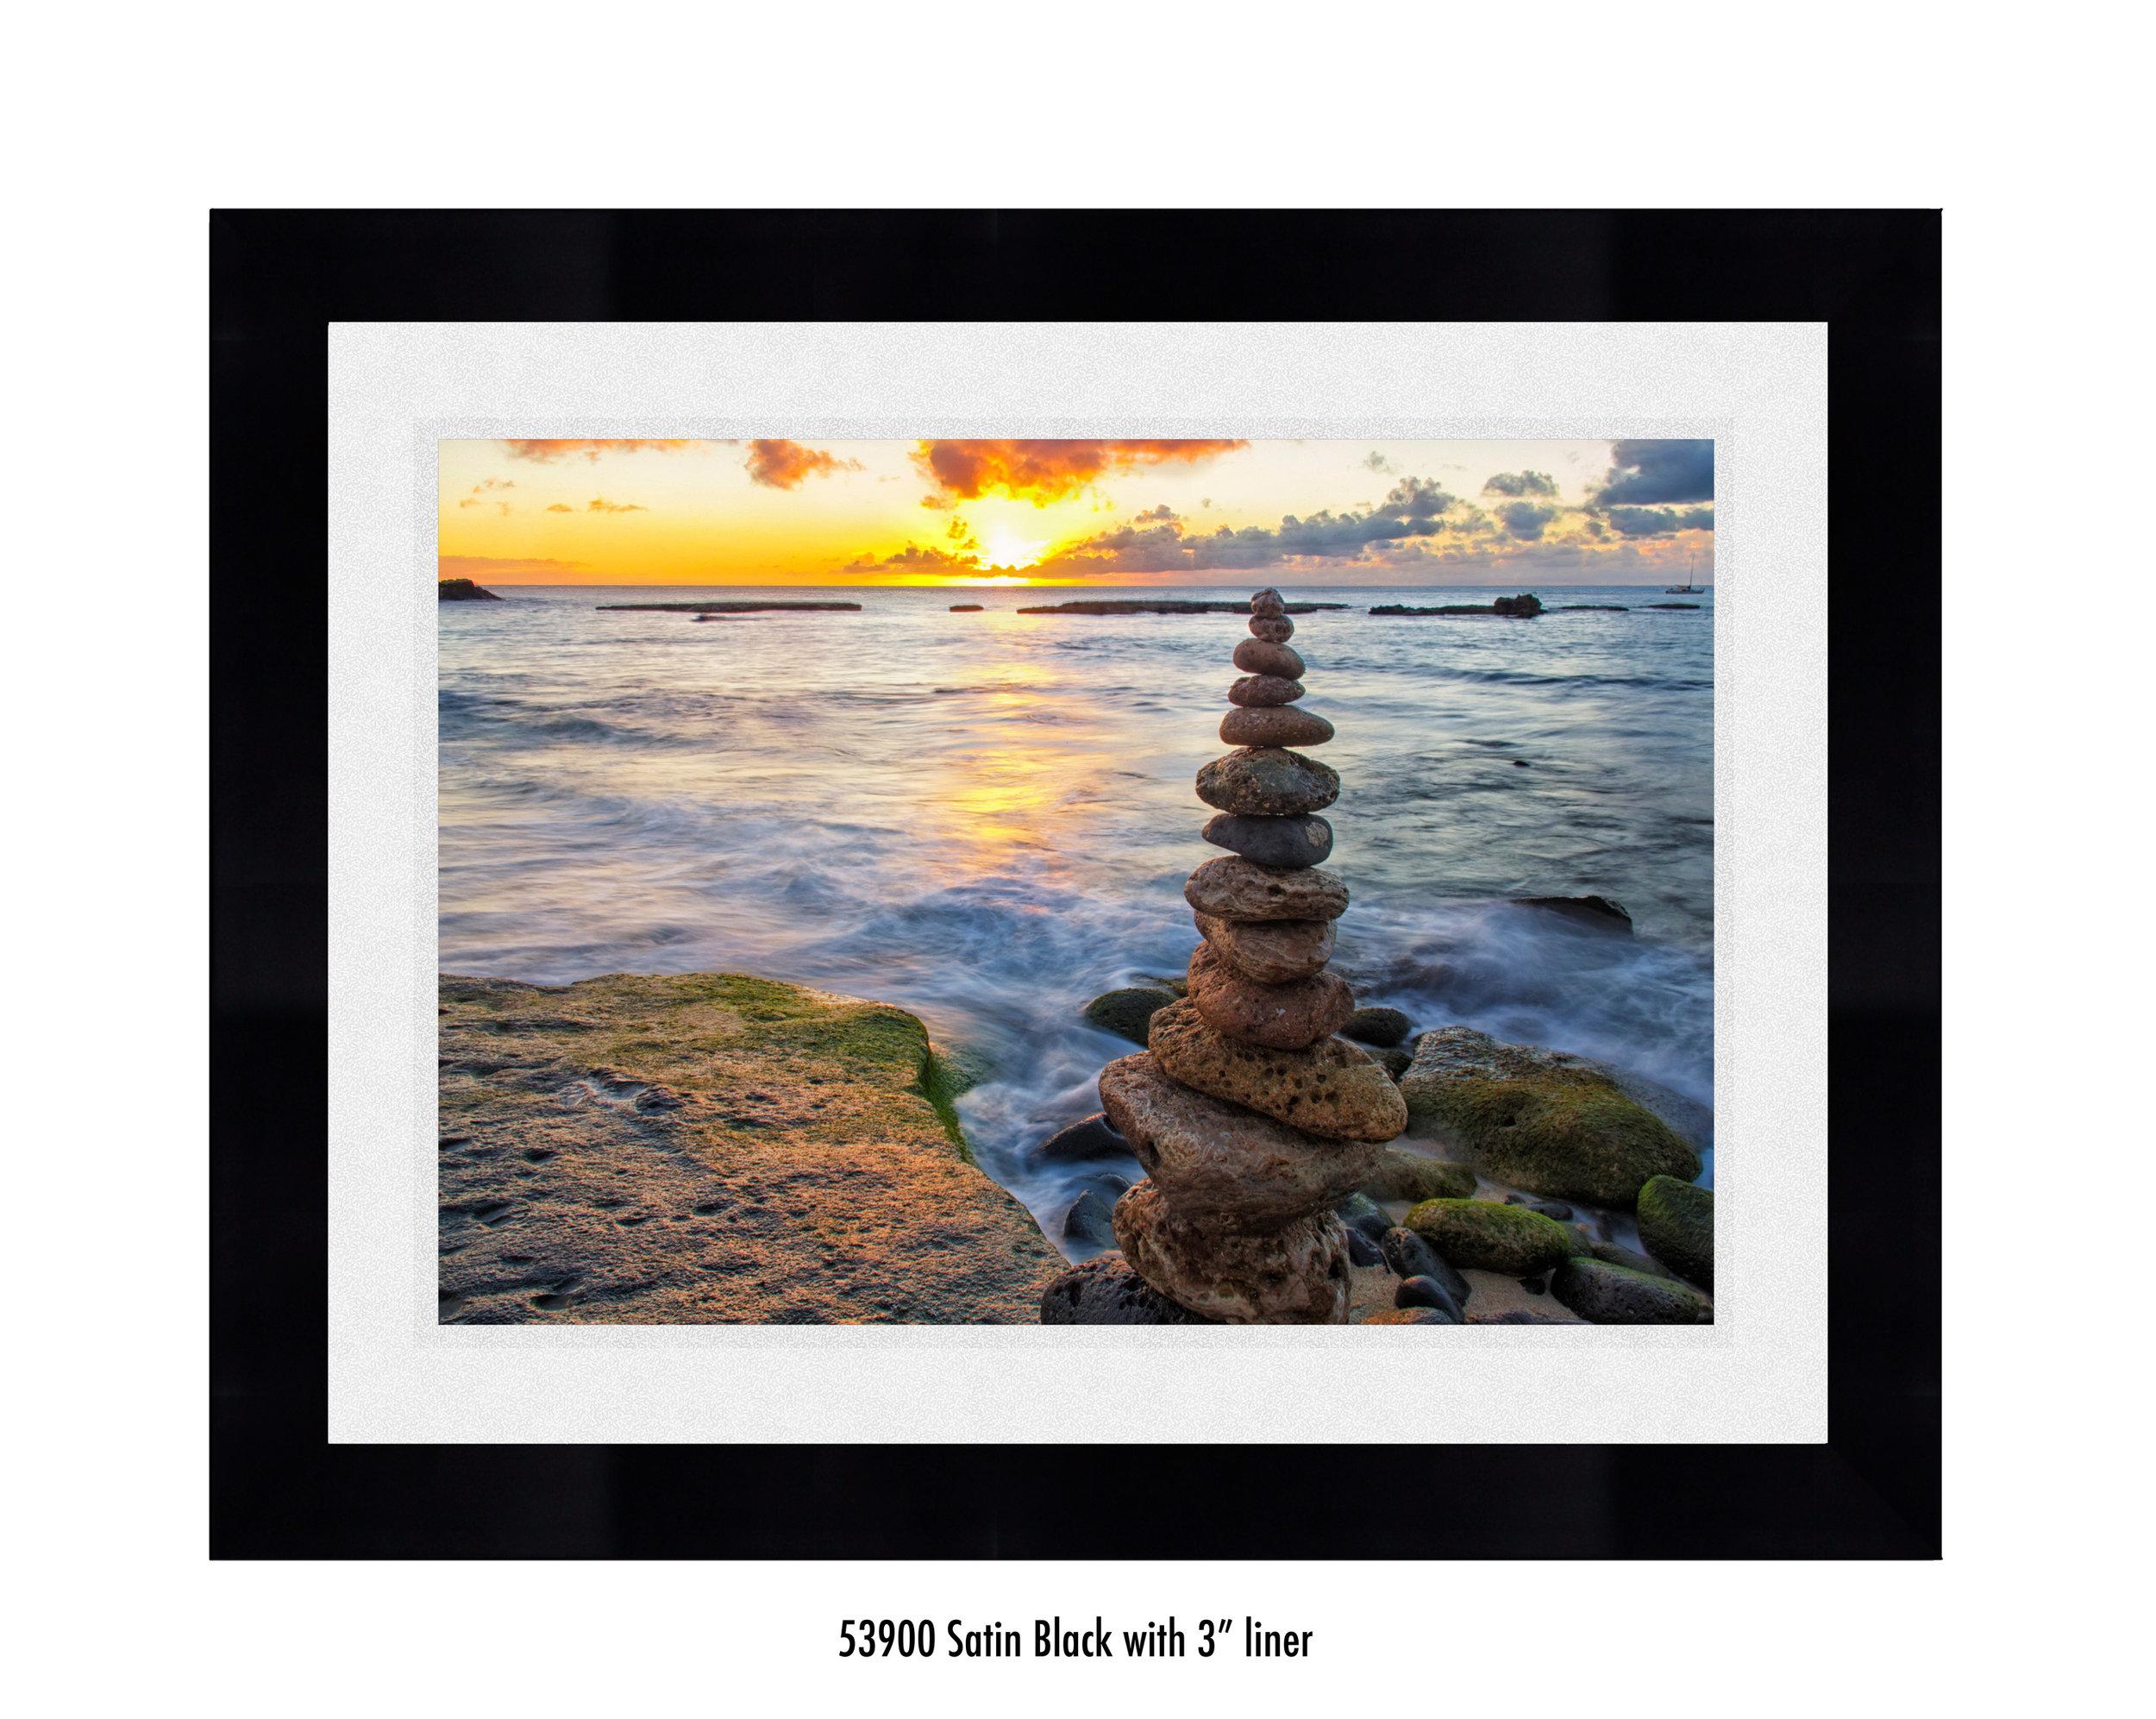 Ahu-Sunset-59300-3-wht.jpg